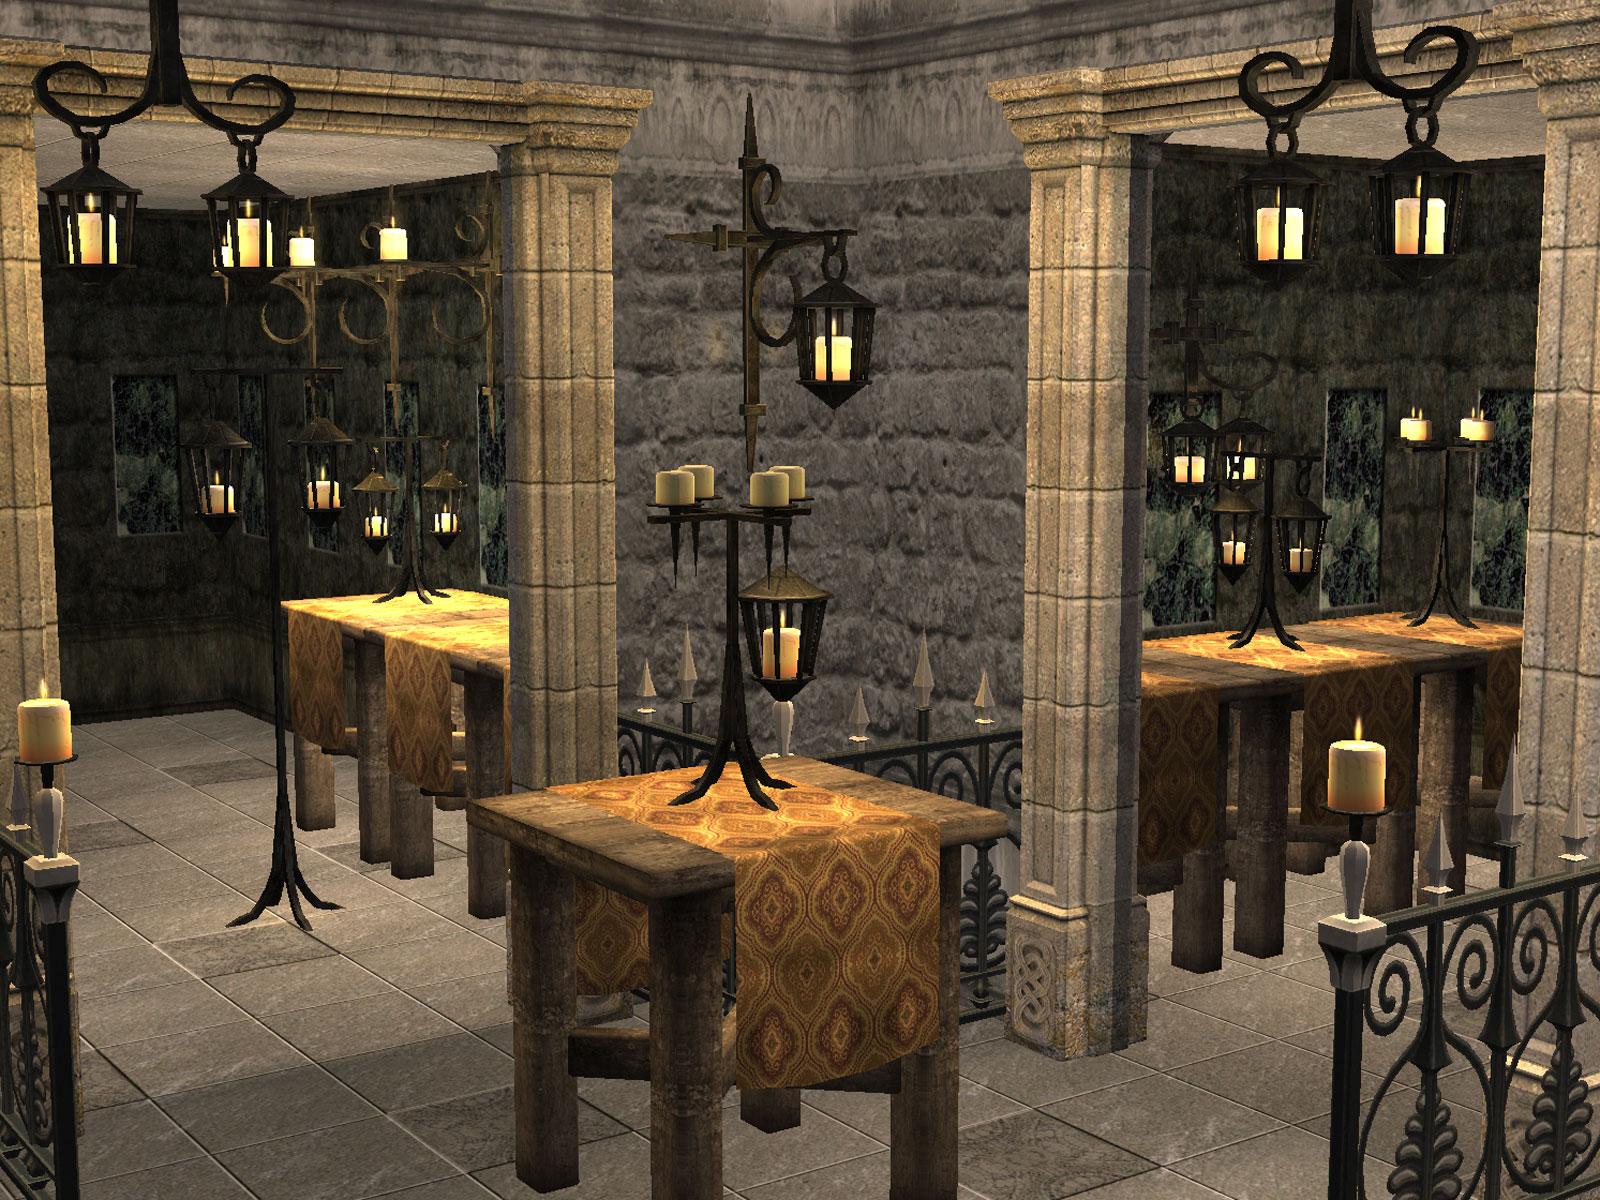 http://www.parsimonious.org/furniture2/files/k8-Imperial_Lamps.jpg